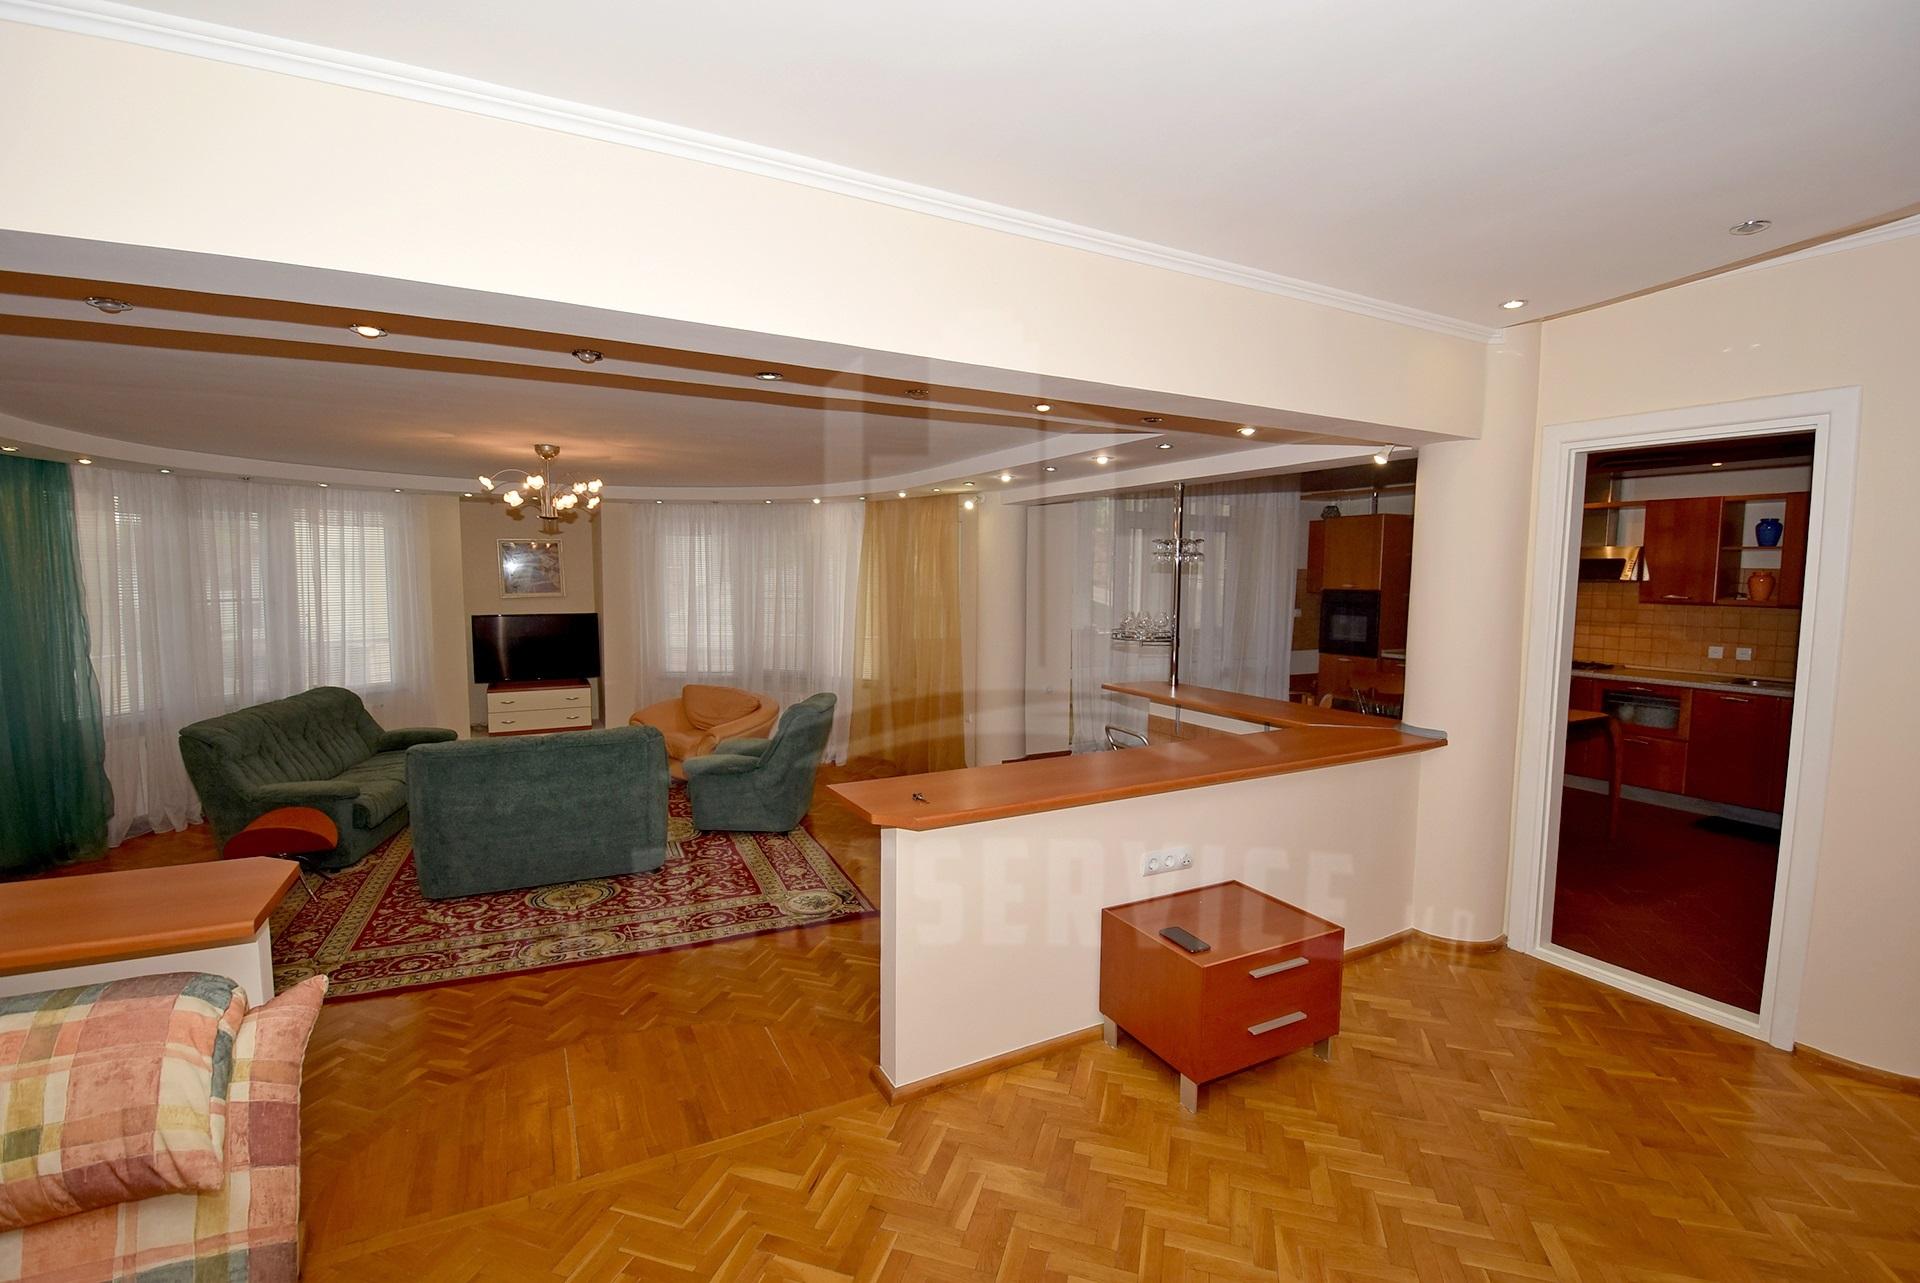 2064_apartment_front.jpg